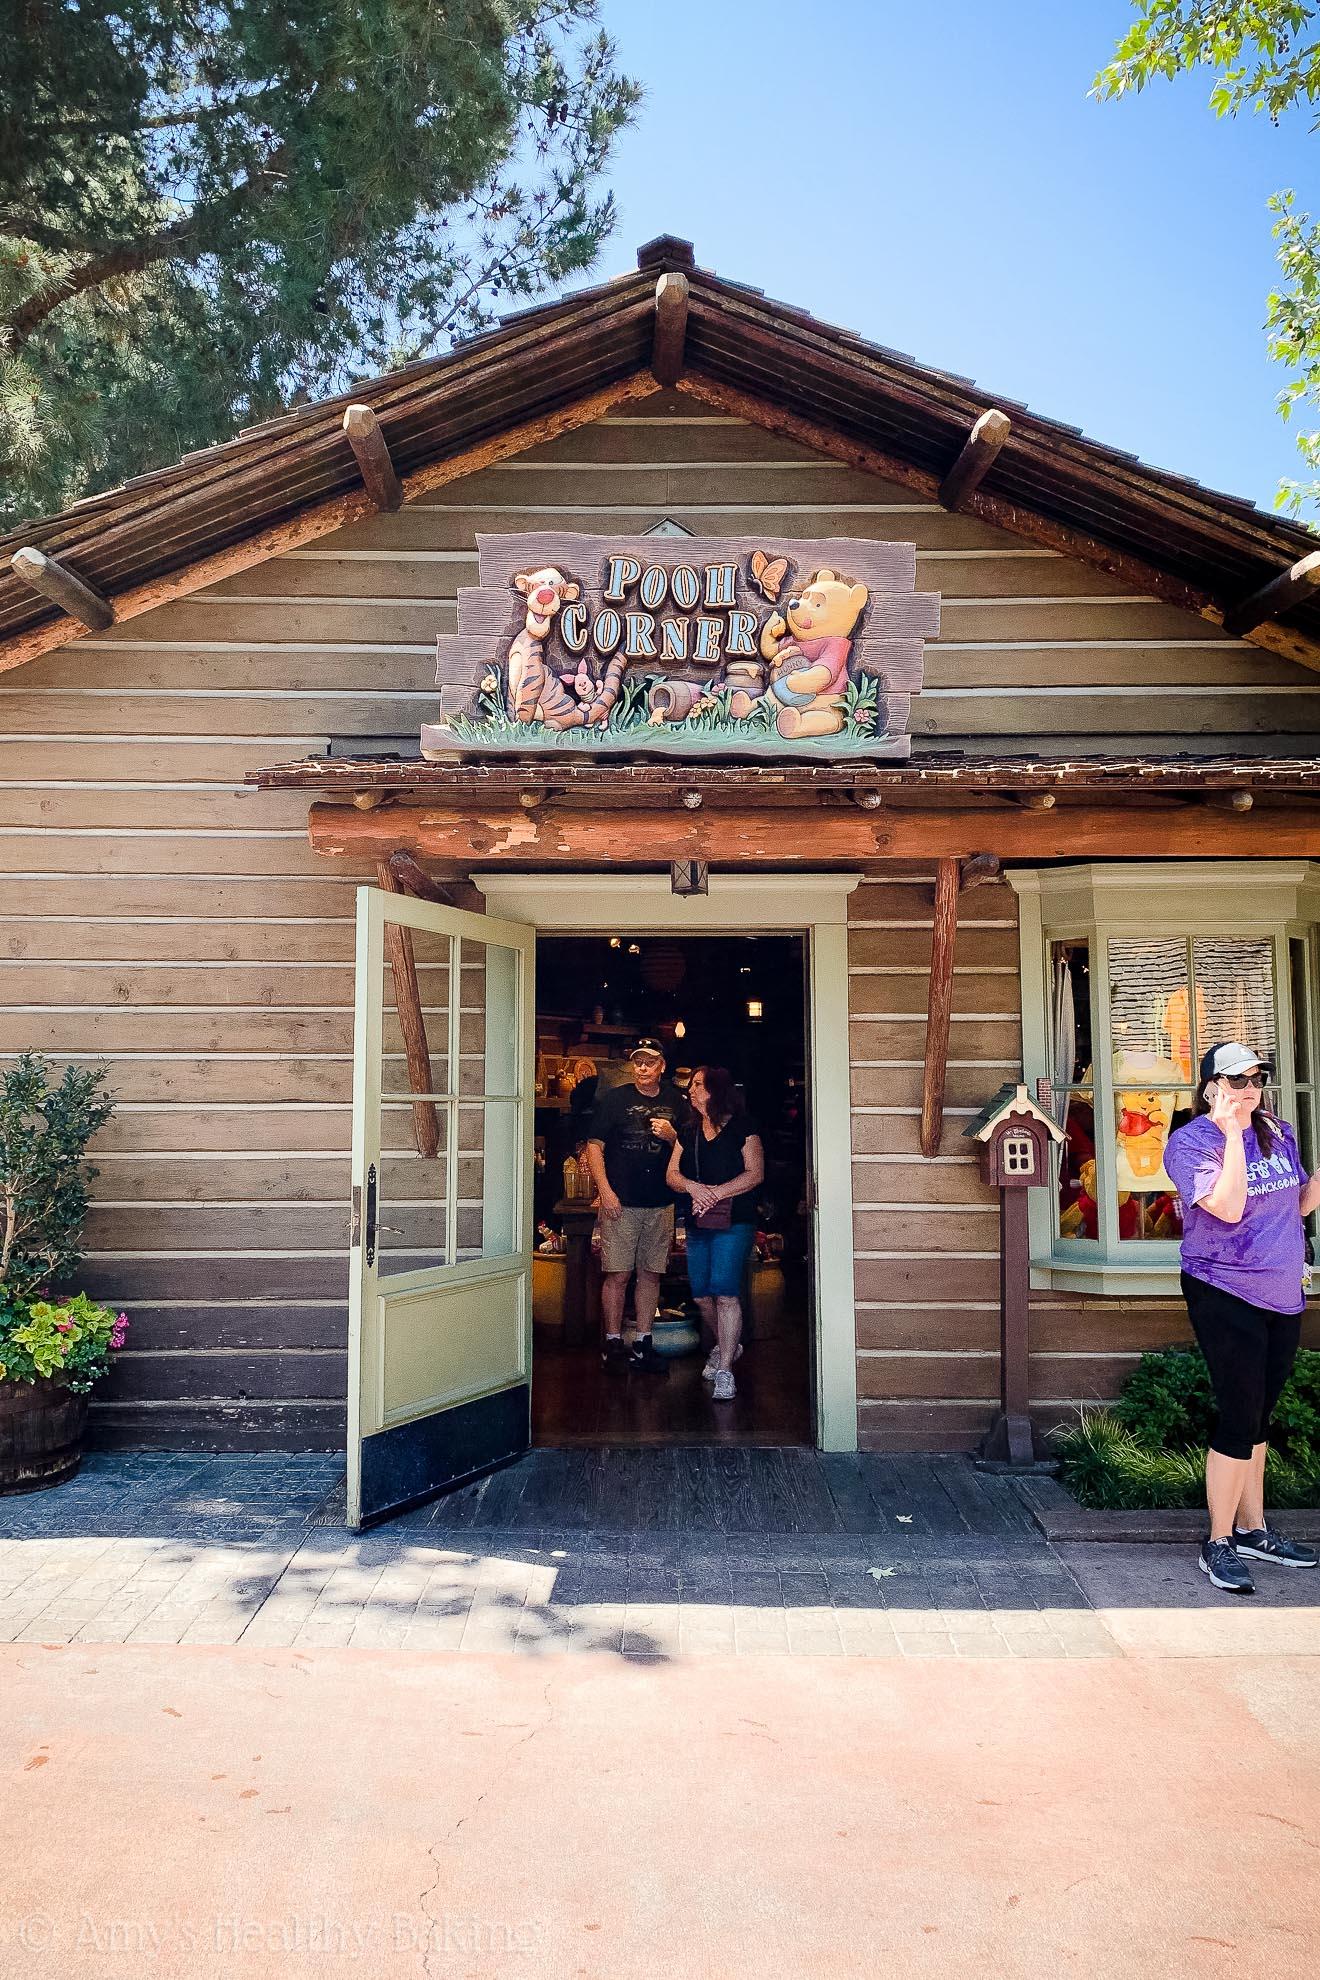 Pooh Corner souvenir shop entrance in Disneyland - Anaheim, California